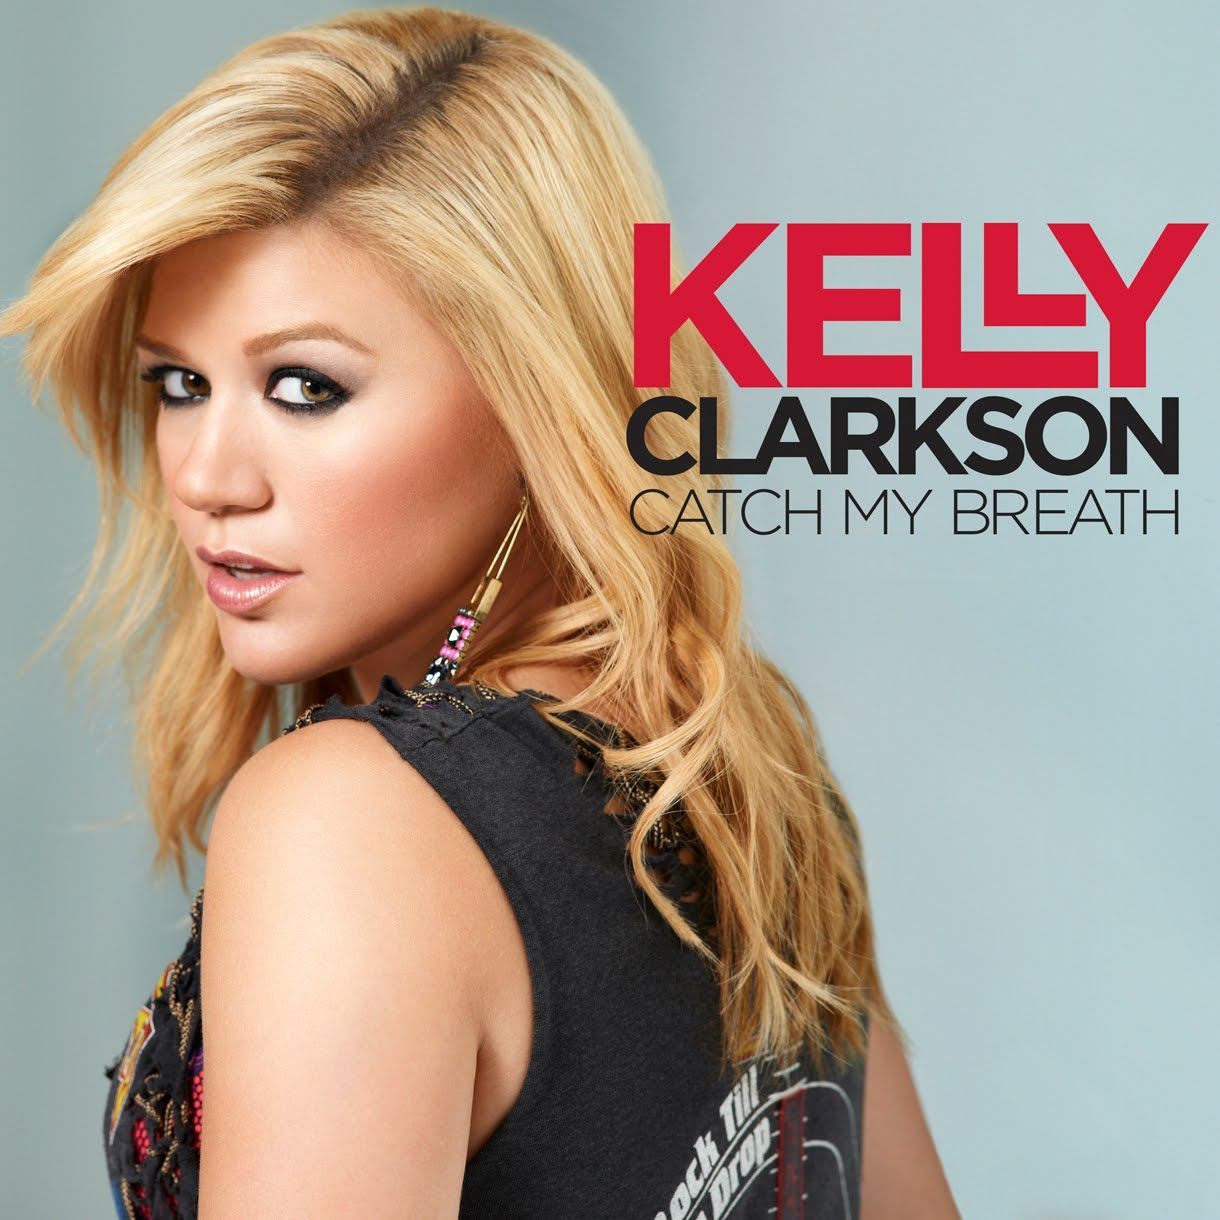 Kelly Clarkson – Catch My Breath (single cover art)